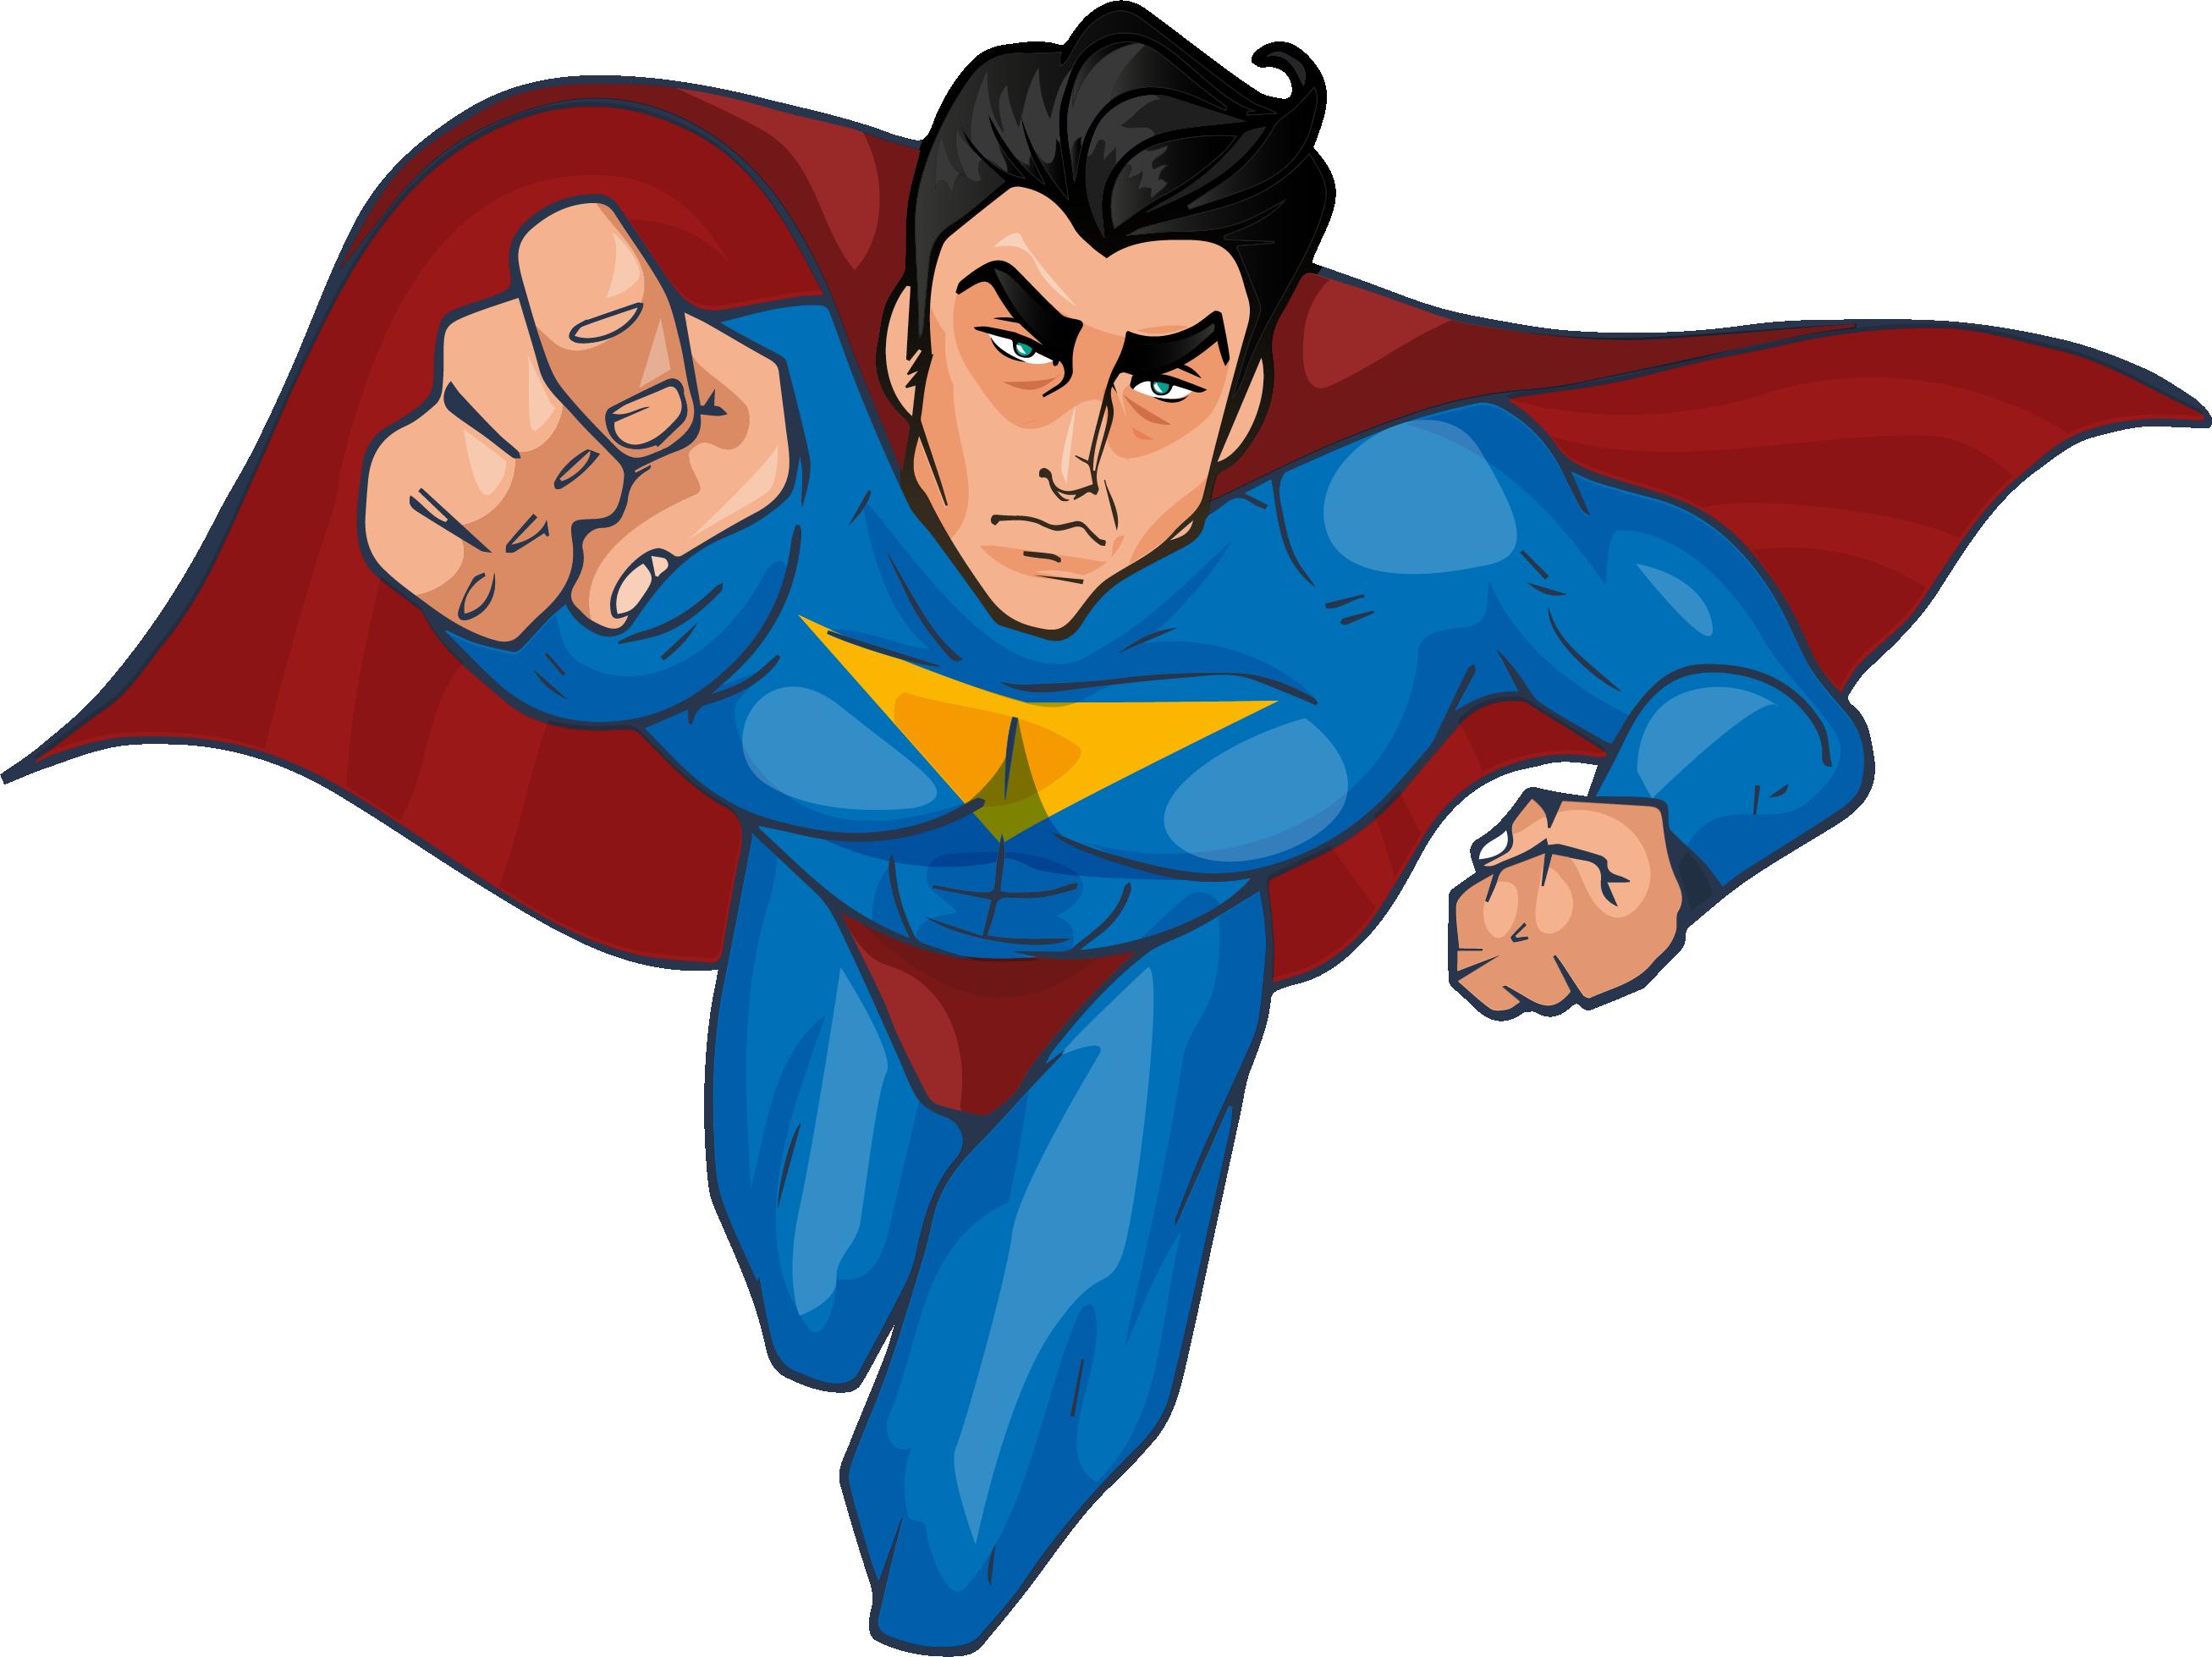 Superman png image jokingart. Superheroes clipart justice league